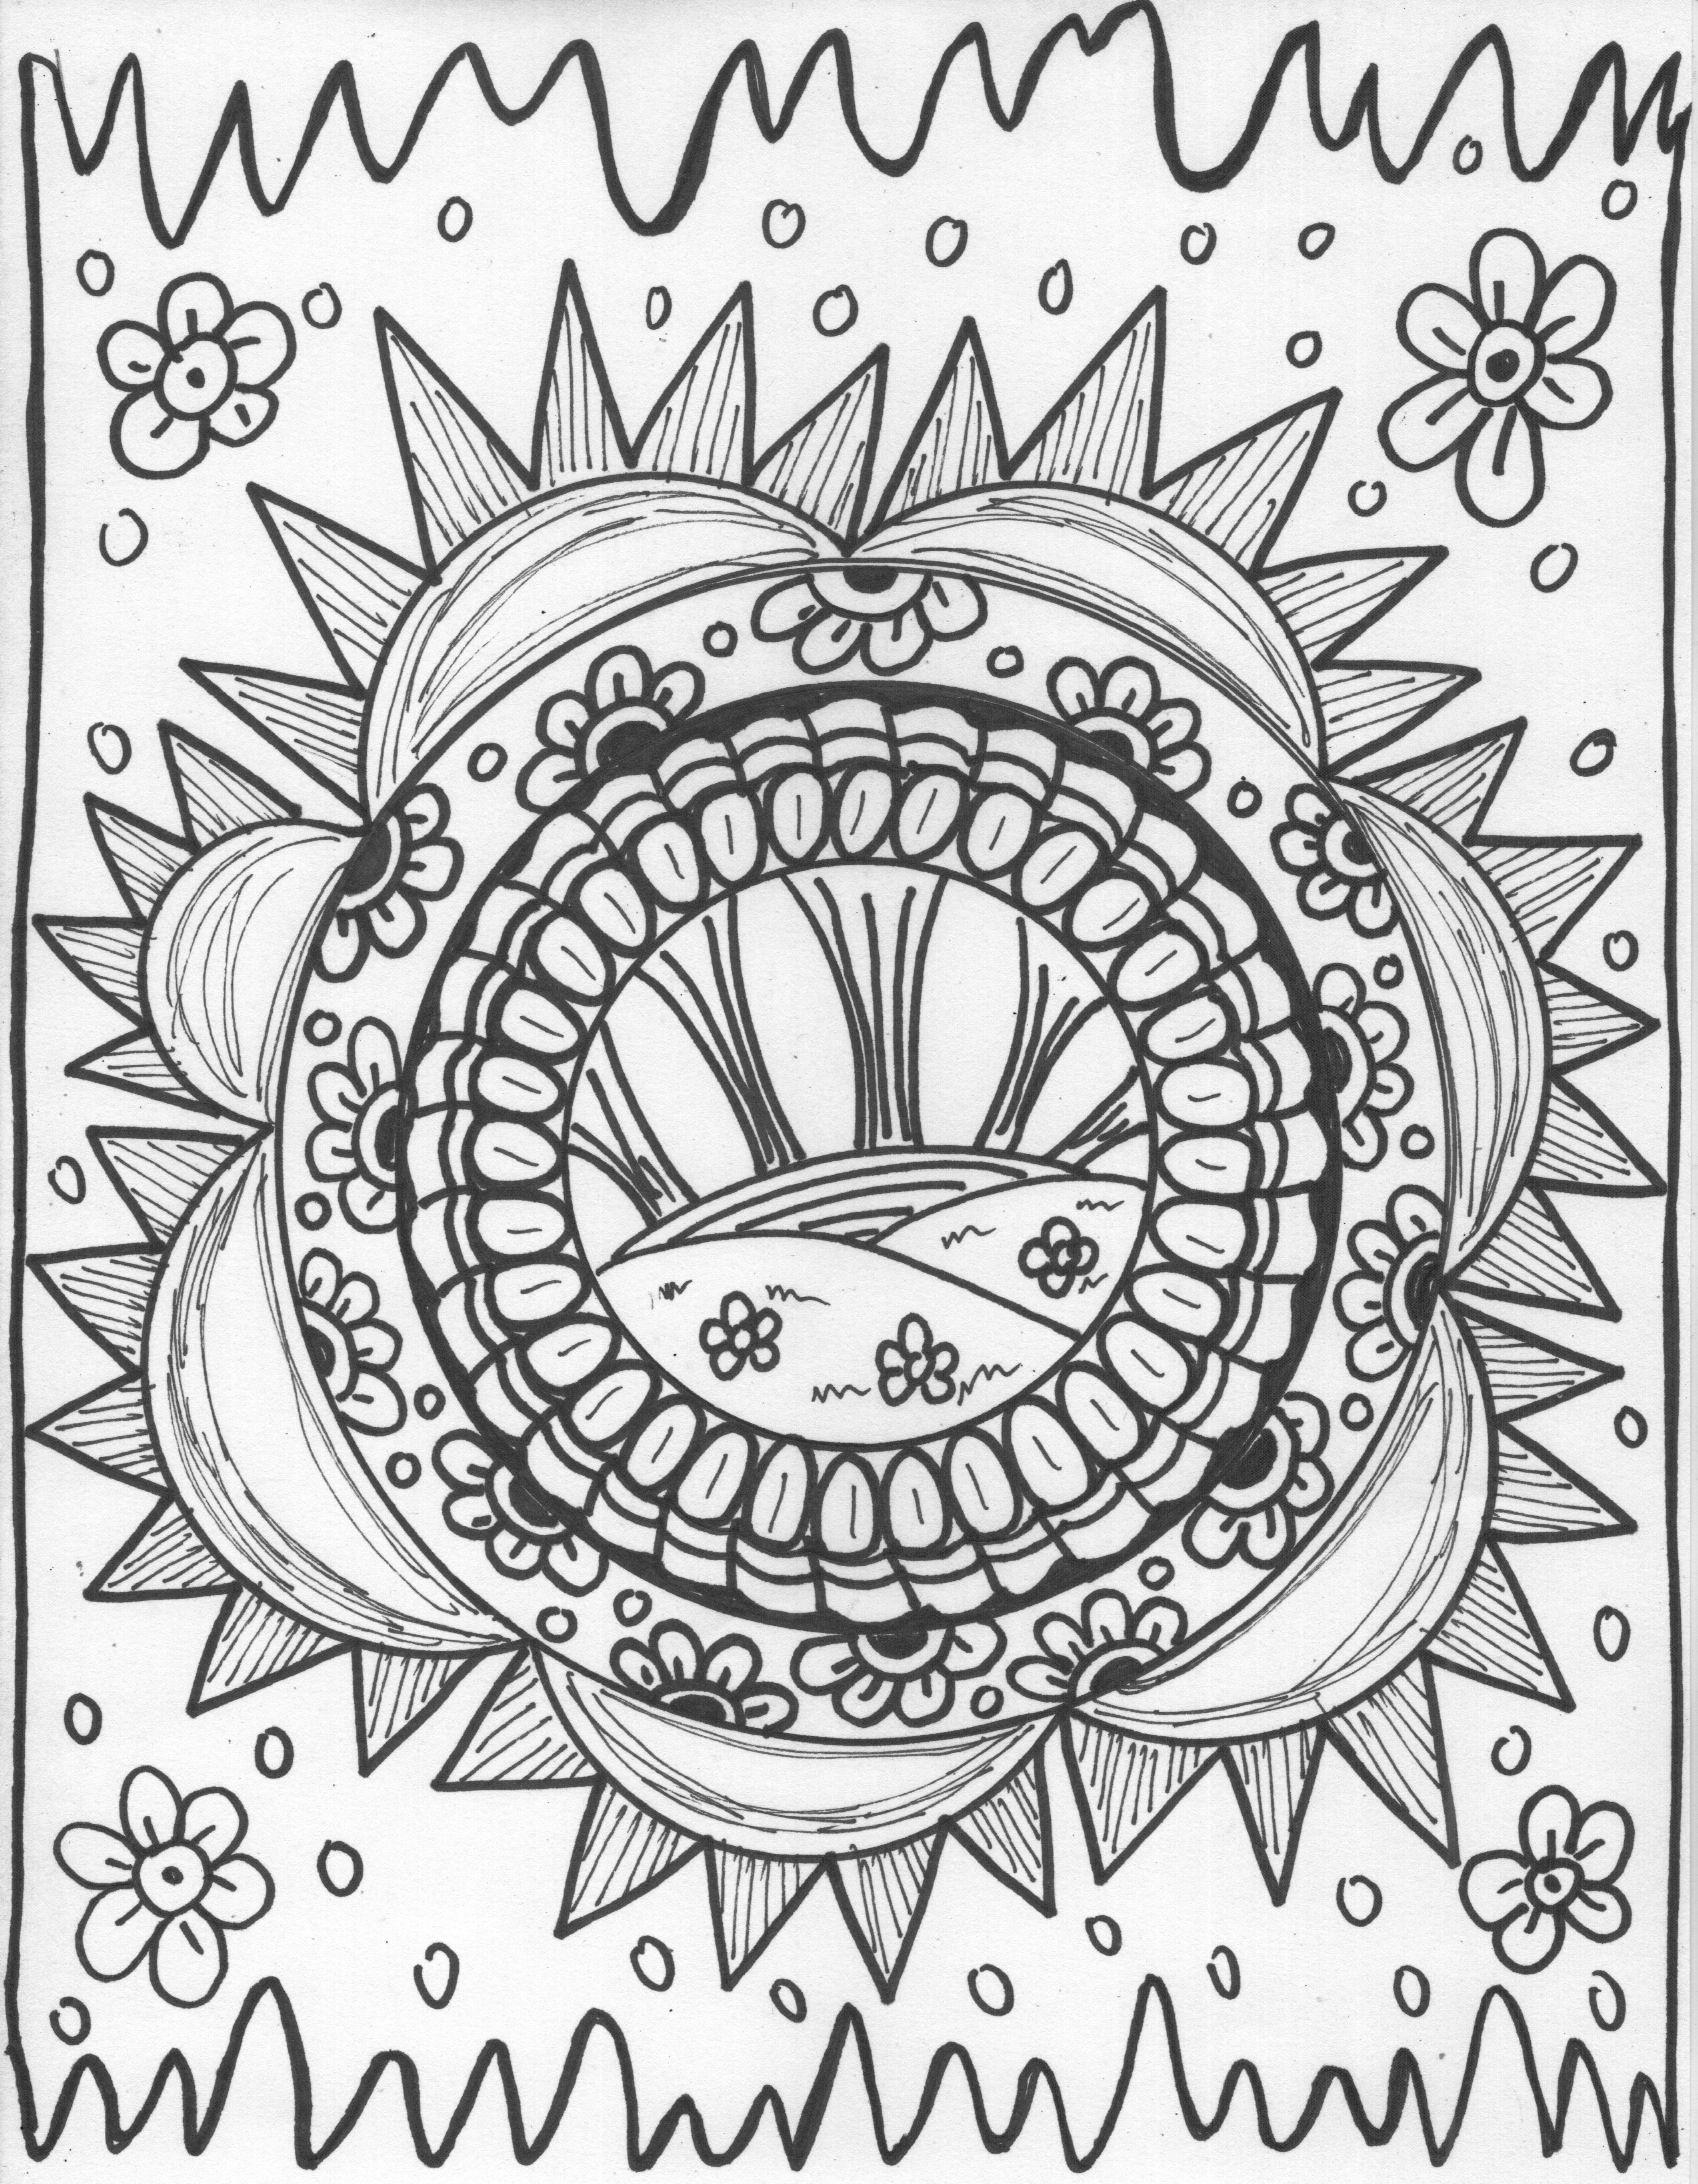 Sun Designs Coloring Book Pg 1 Rising Sun Sun Coloring Pages Moon Coloring Pages Coloring Pages